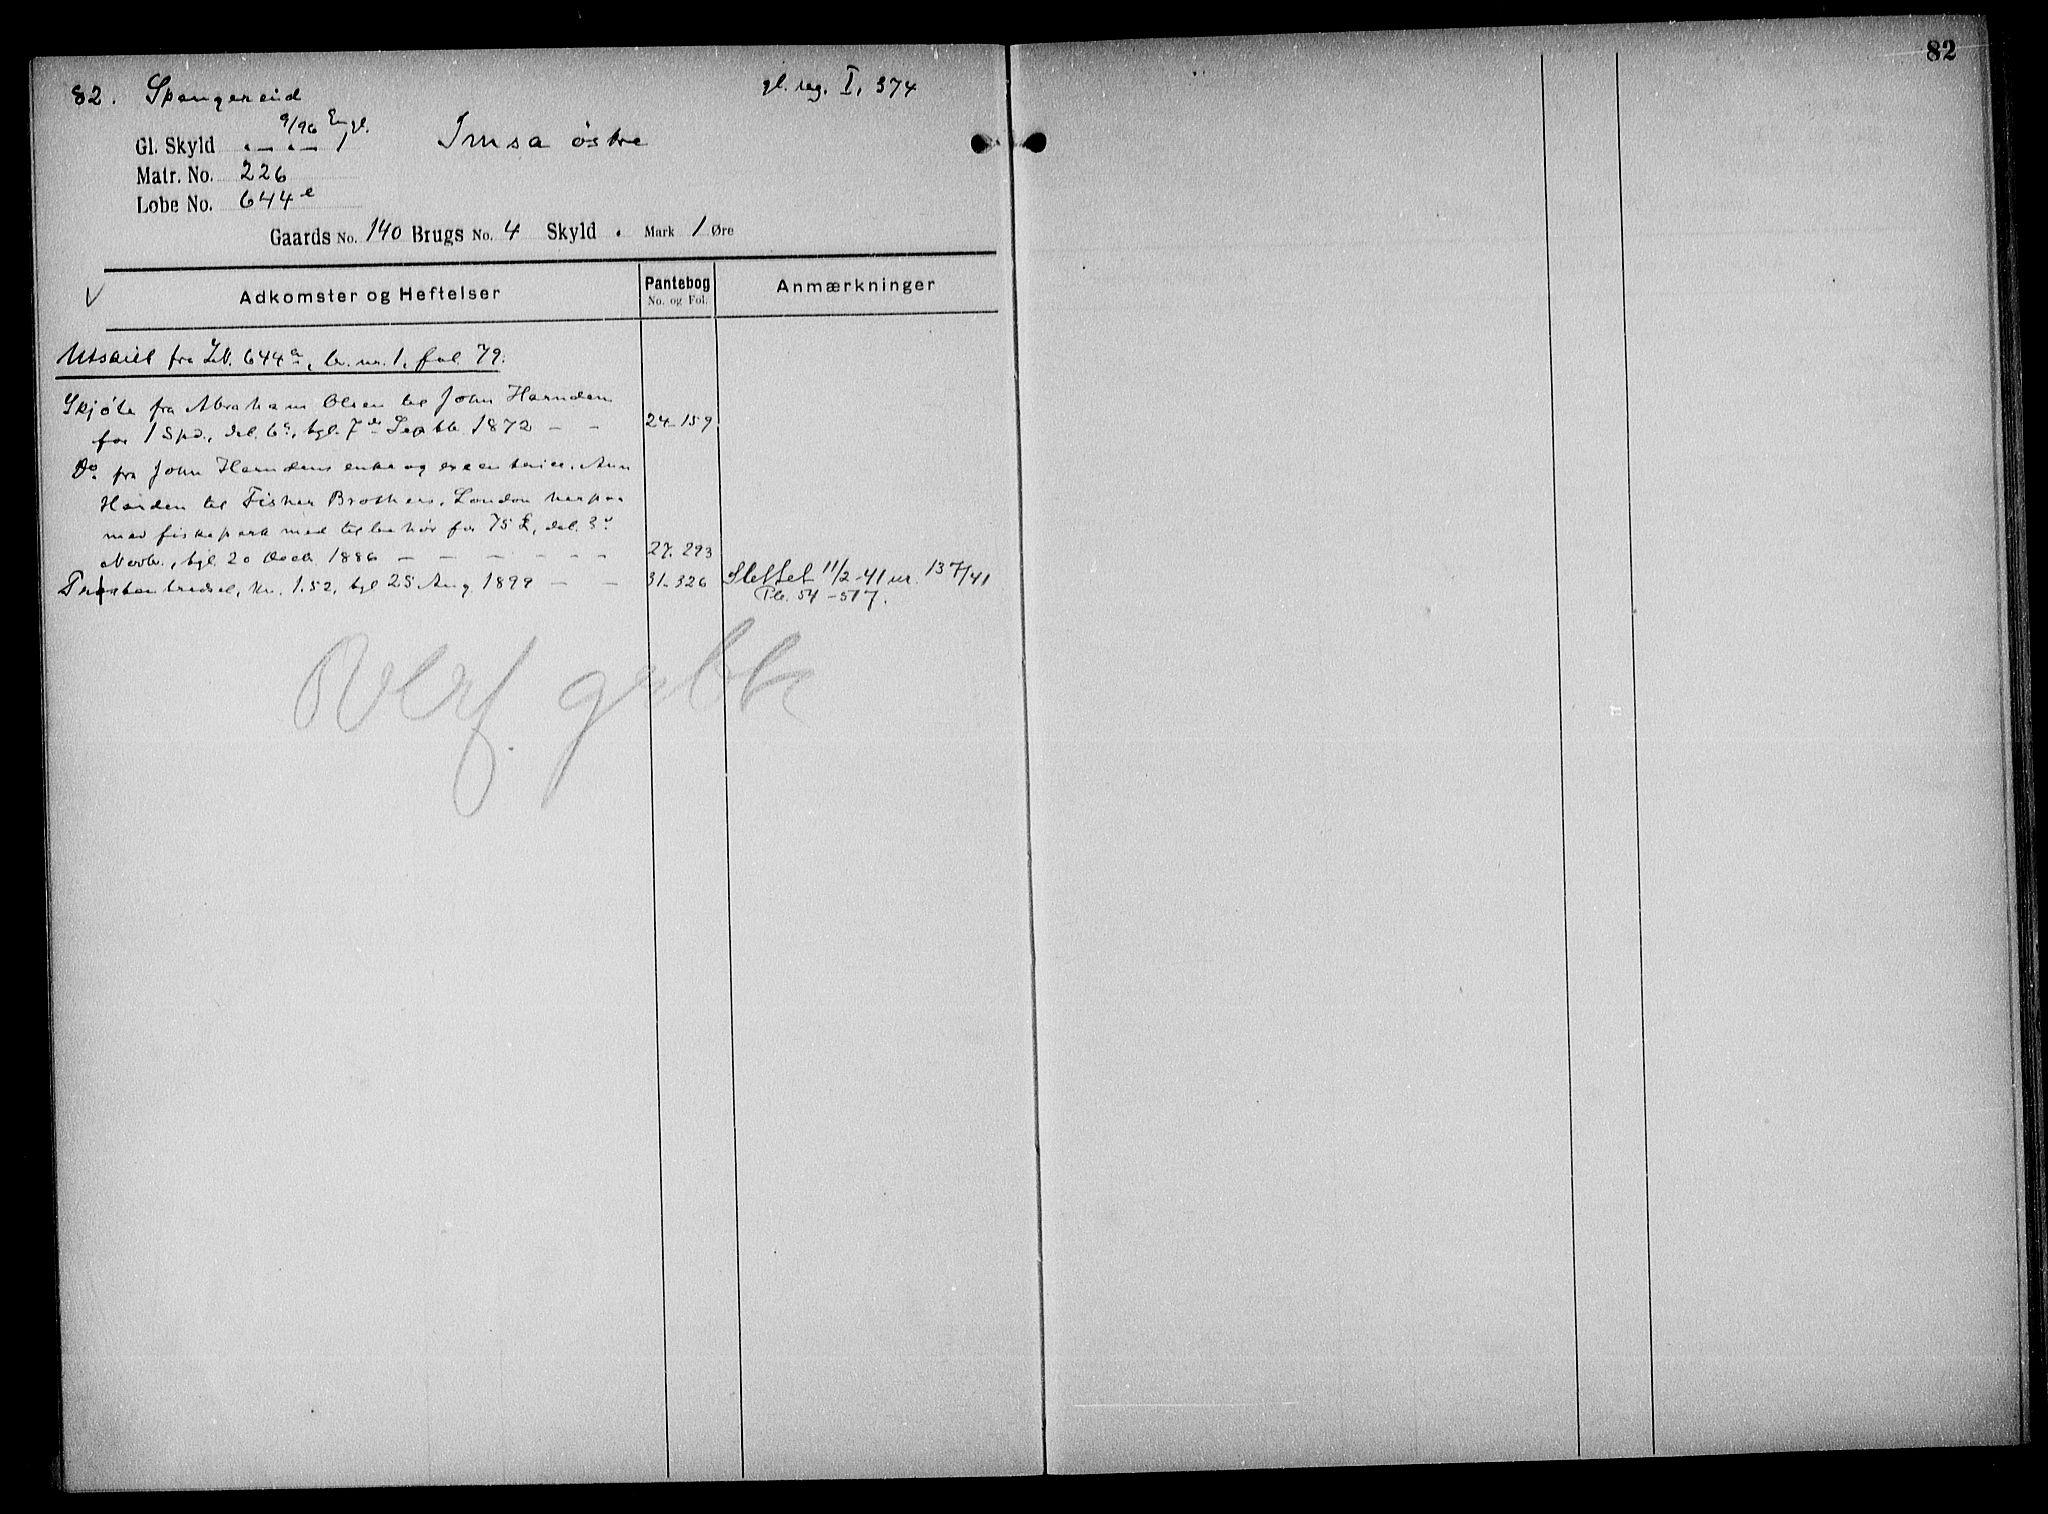 SAK, Mandal sorenskriveri, G/Ga/L0044: Panteregister nr. 40a, 1810-1952, s. 82